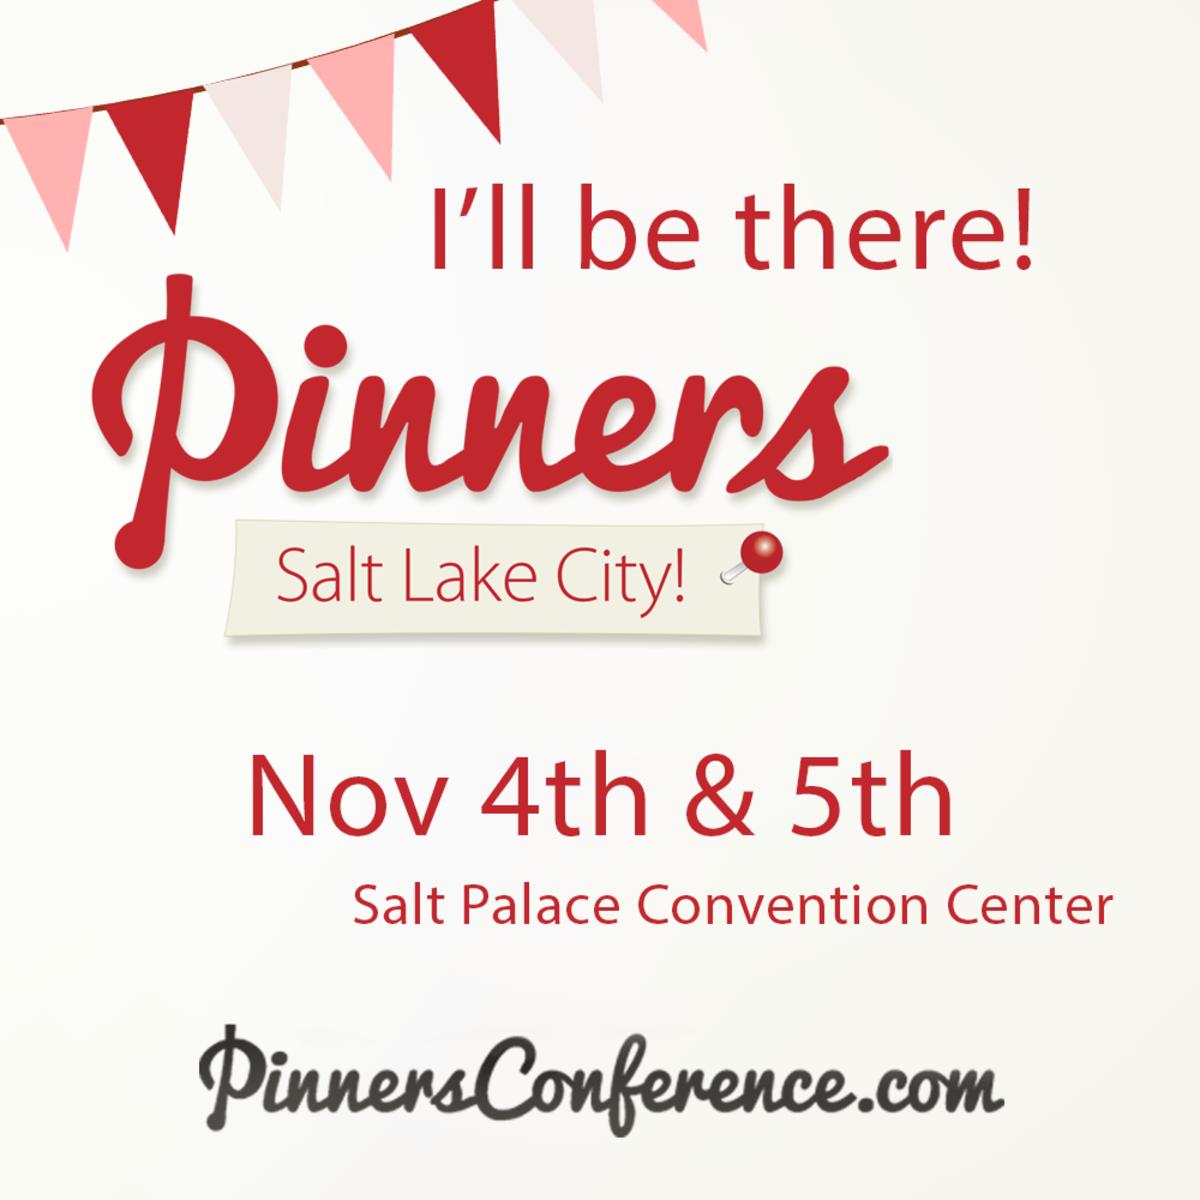 Utah Pinners Conference